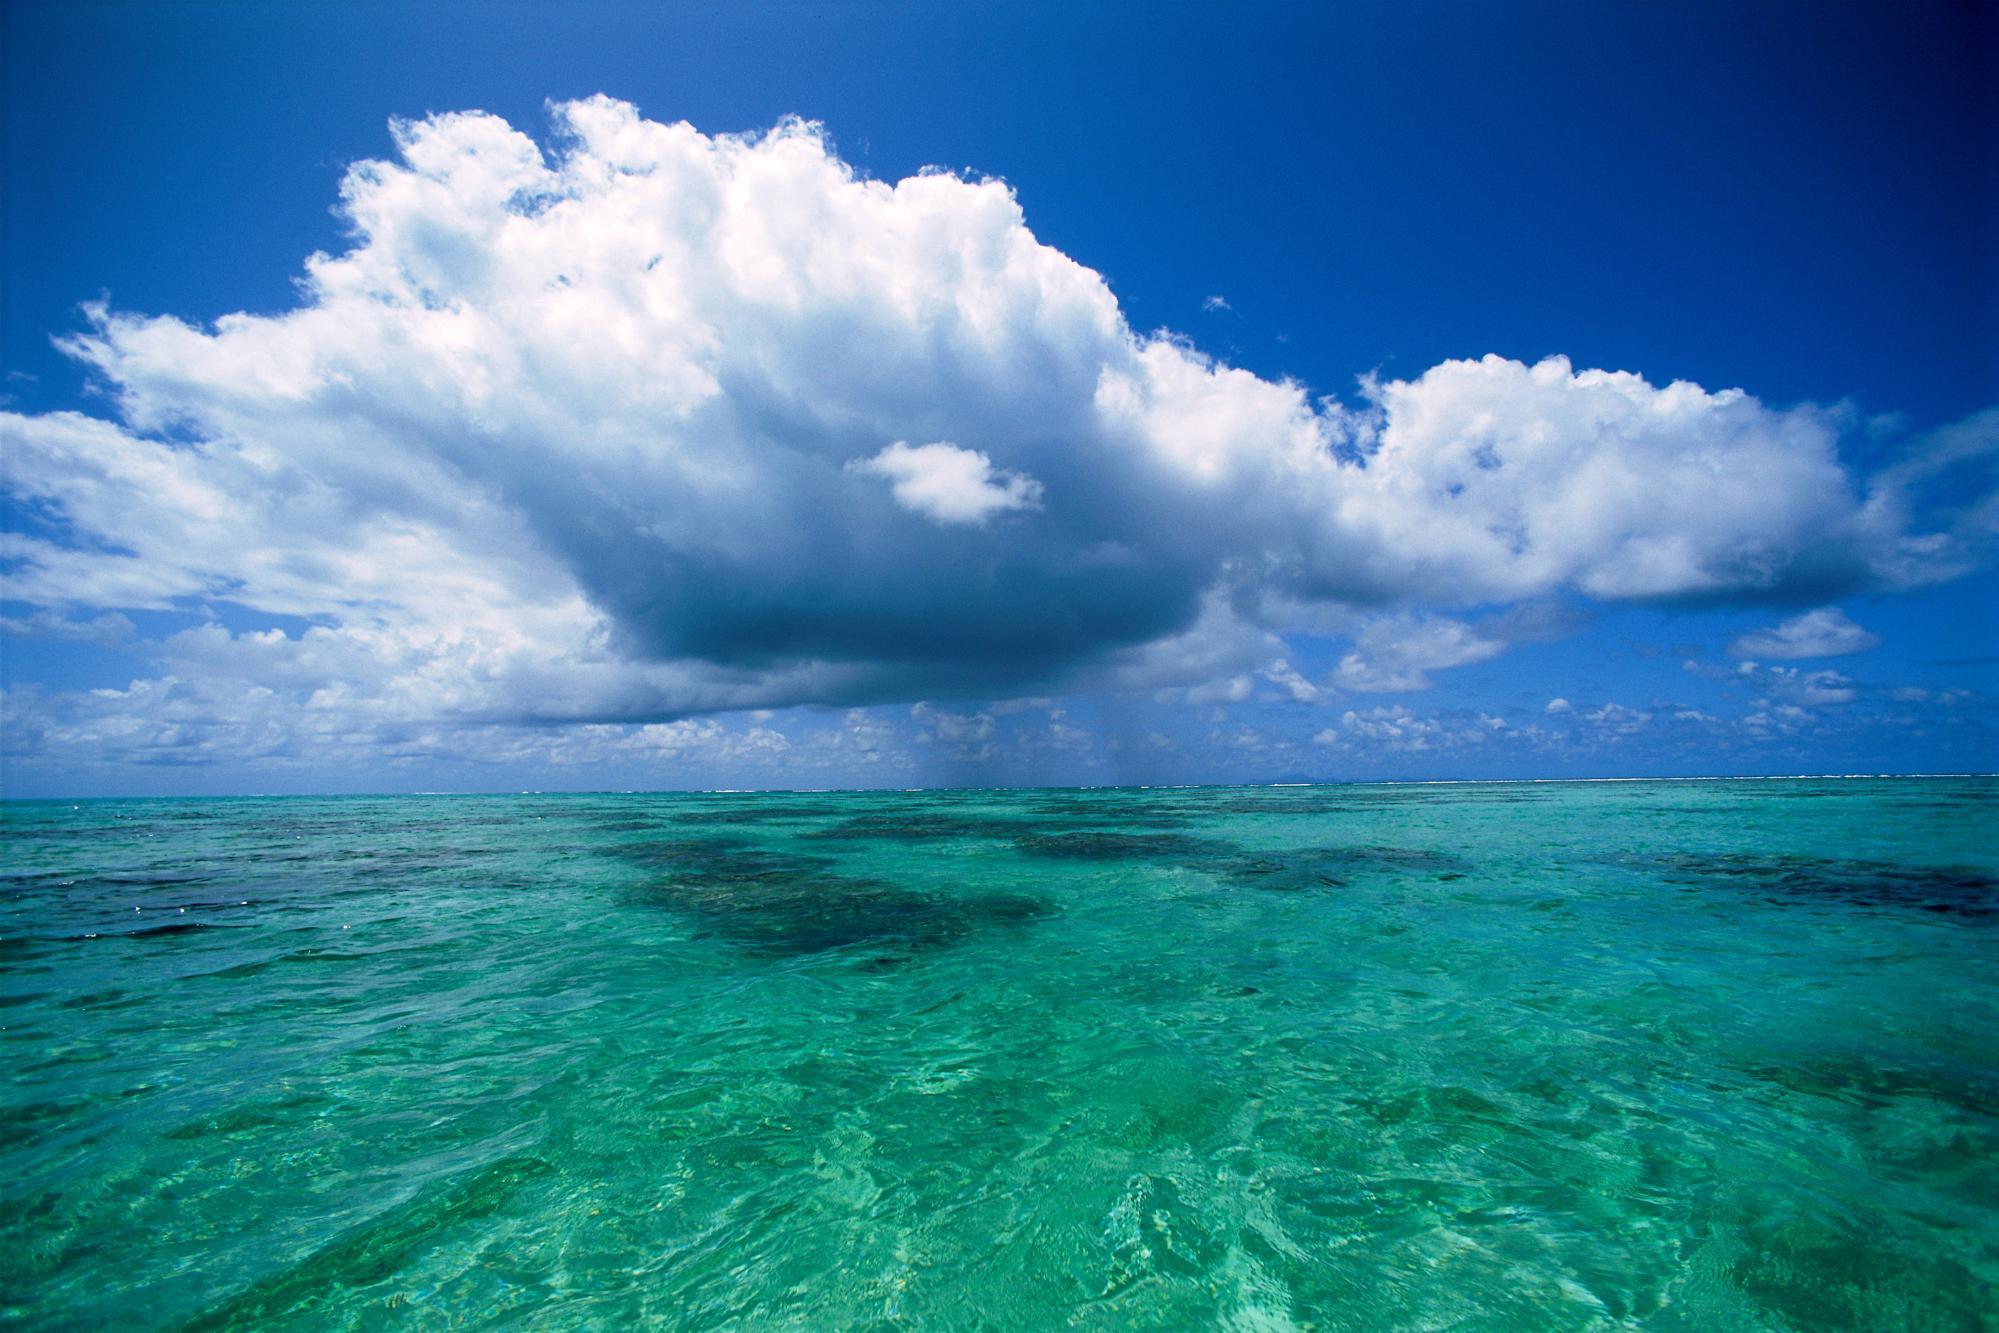 agua dulce debajo del mar